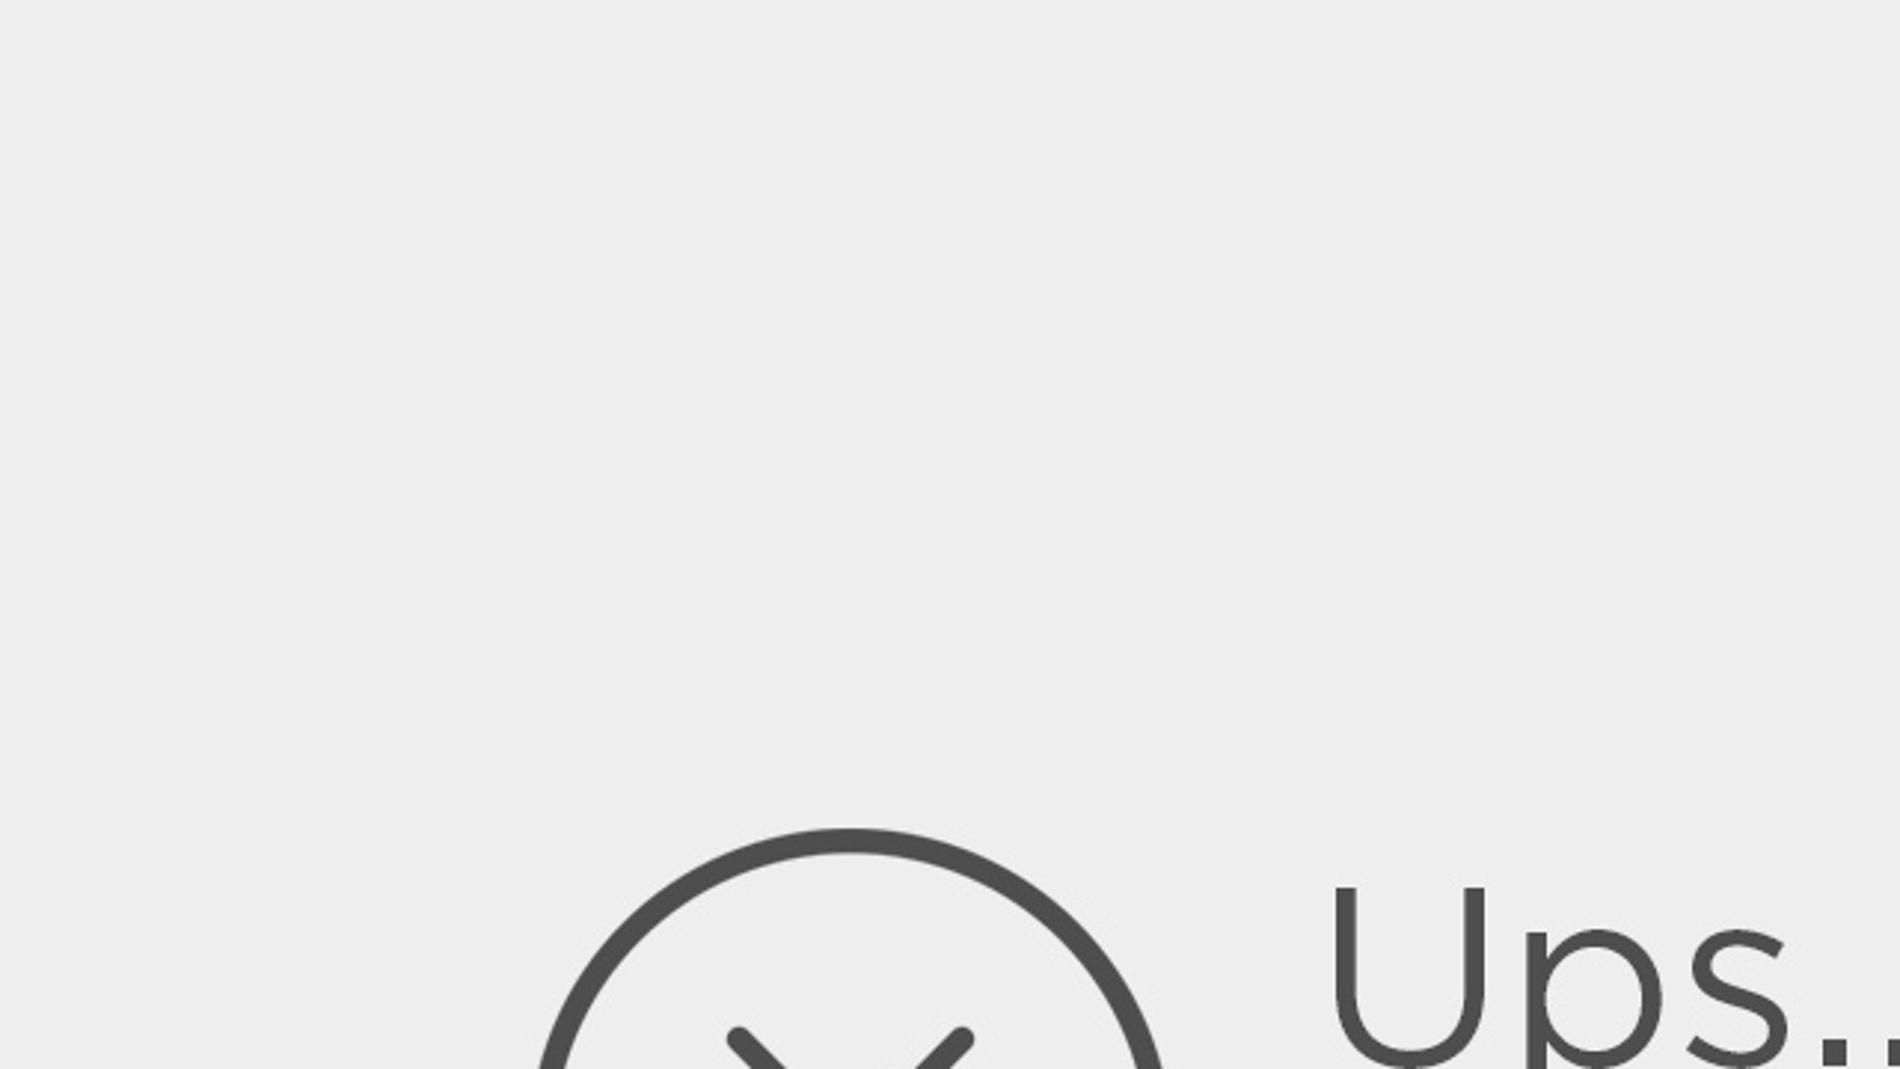 Chris Pratt y su moto en 'Jurassic World'